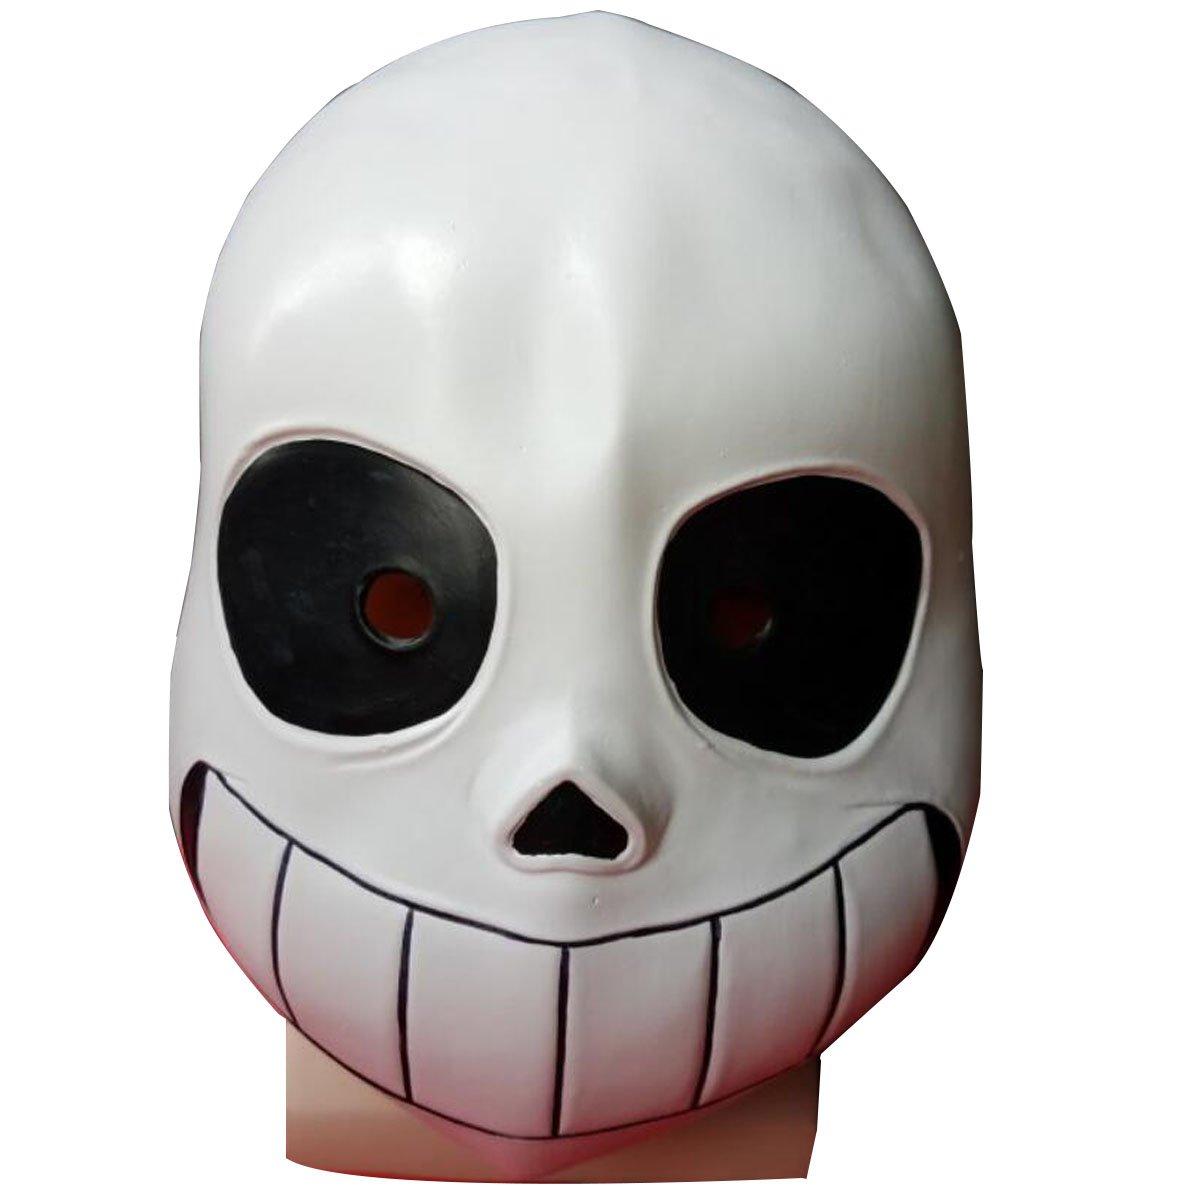 Nsoking Latex Full Head Sans Latex Mask Cosplay Cartoon Skull Mask Pro